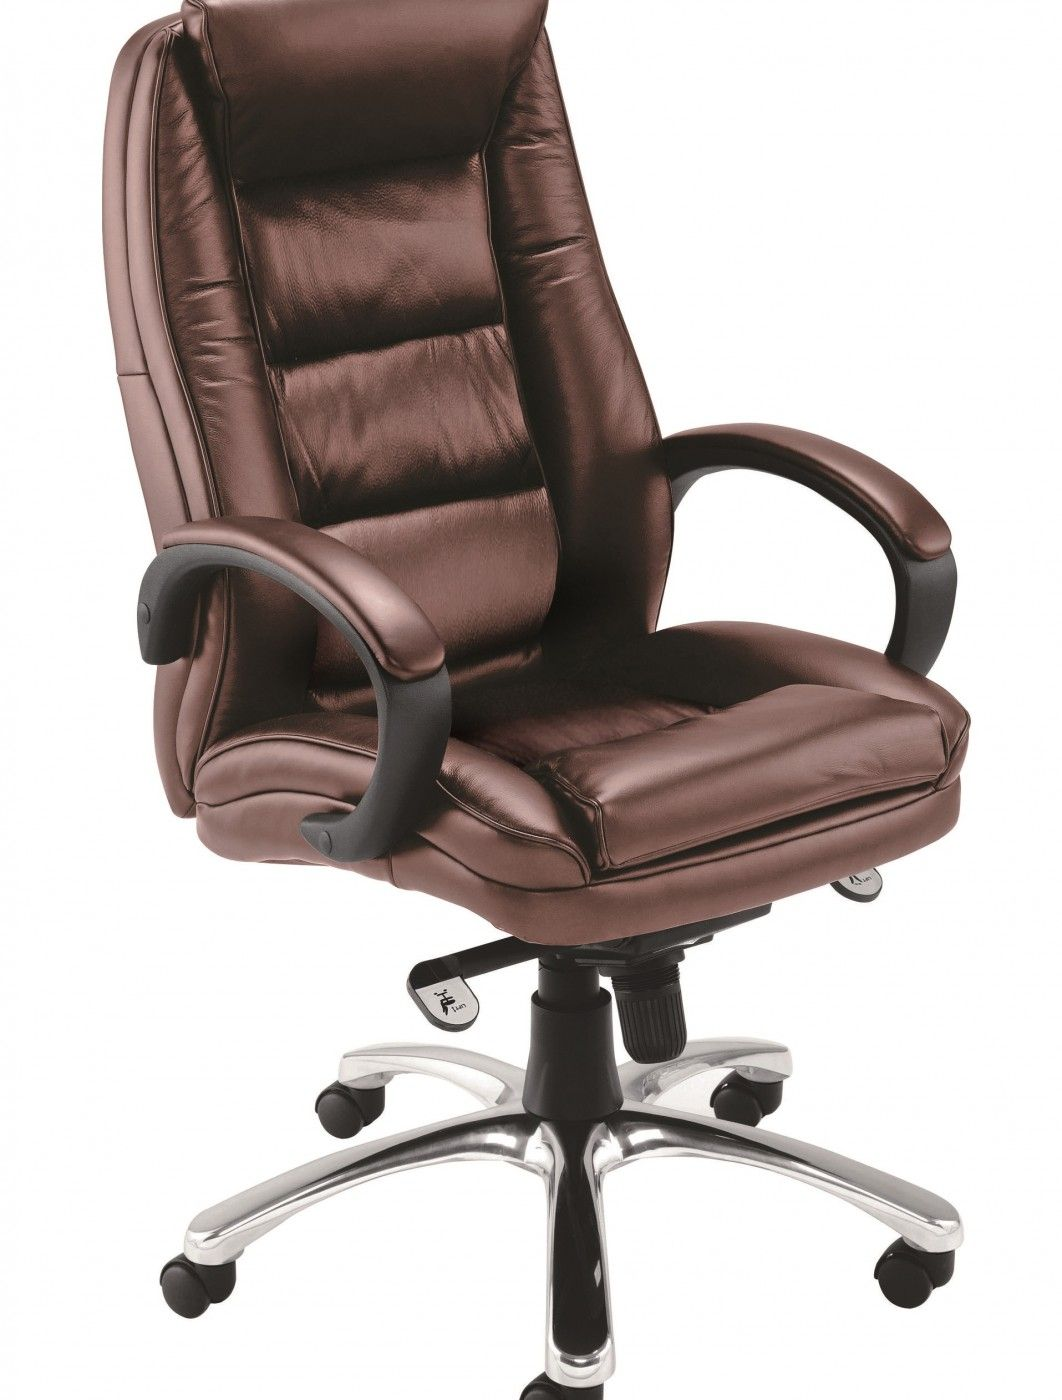 Executive Leather Office Chair Stuhle Und Leder